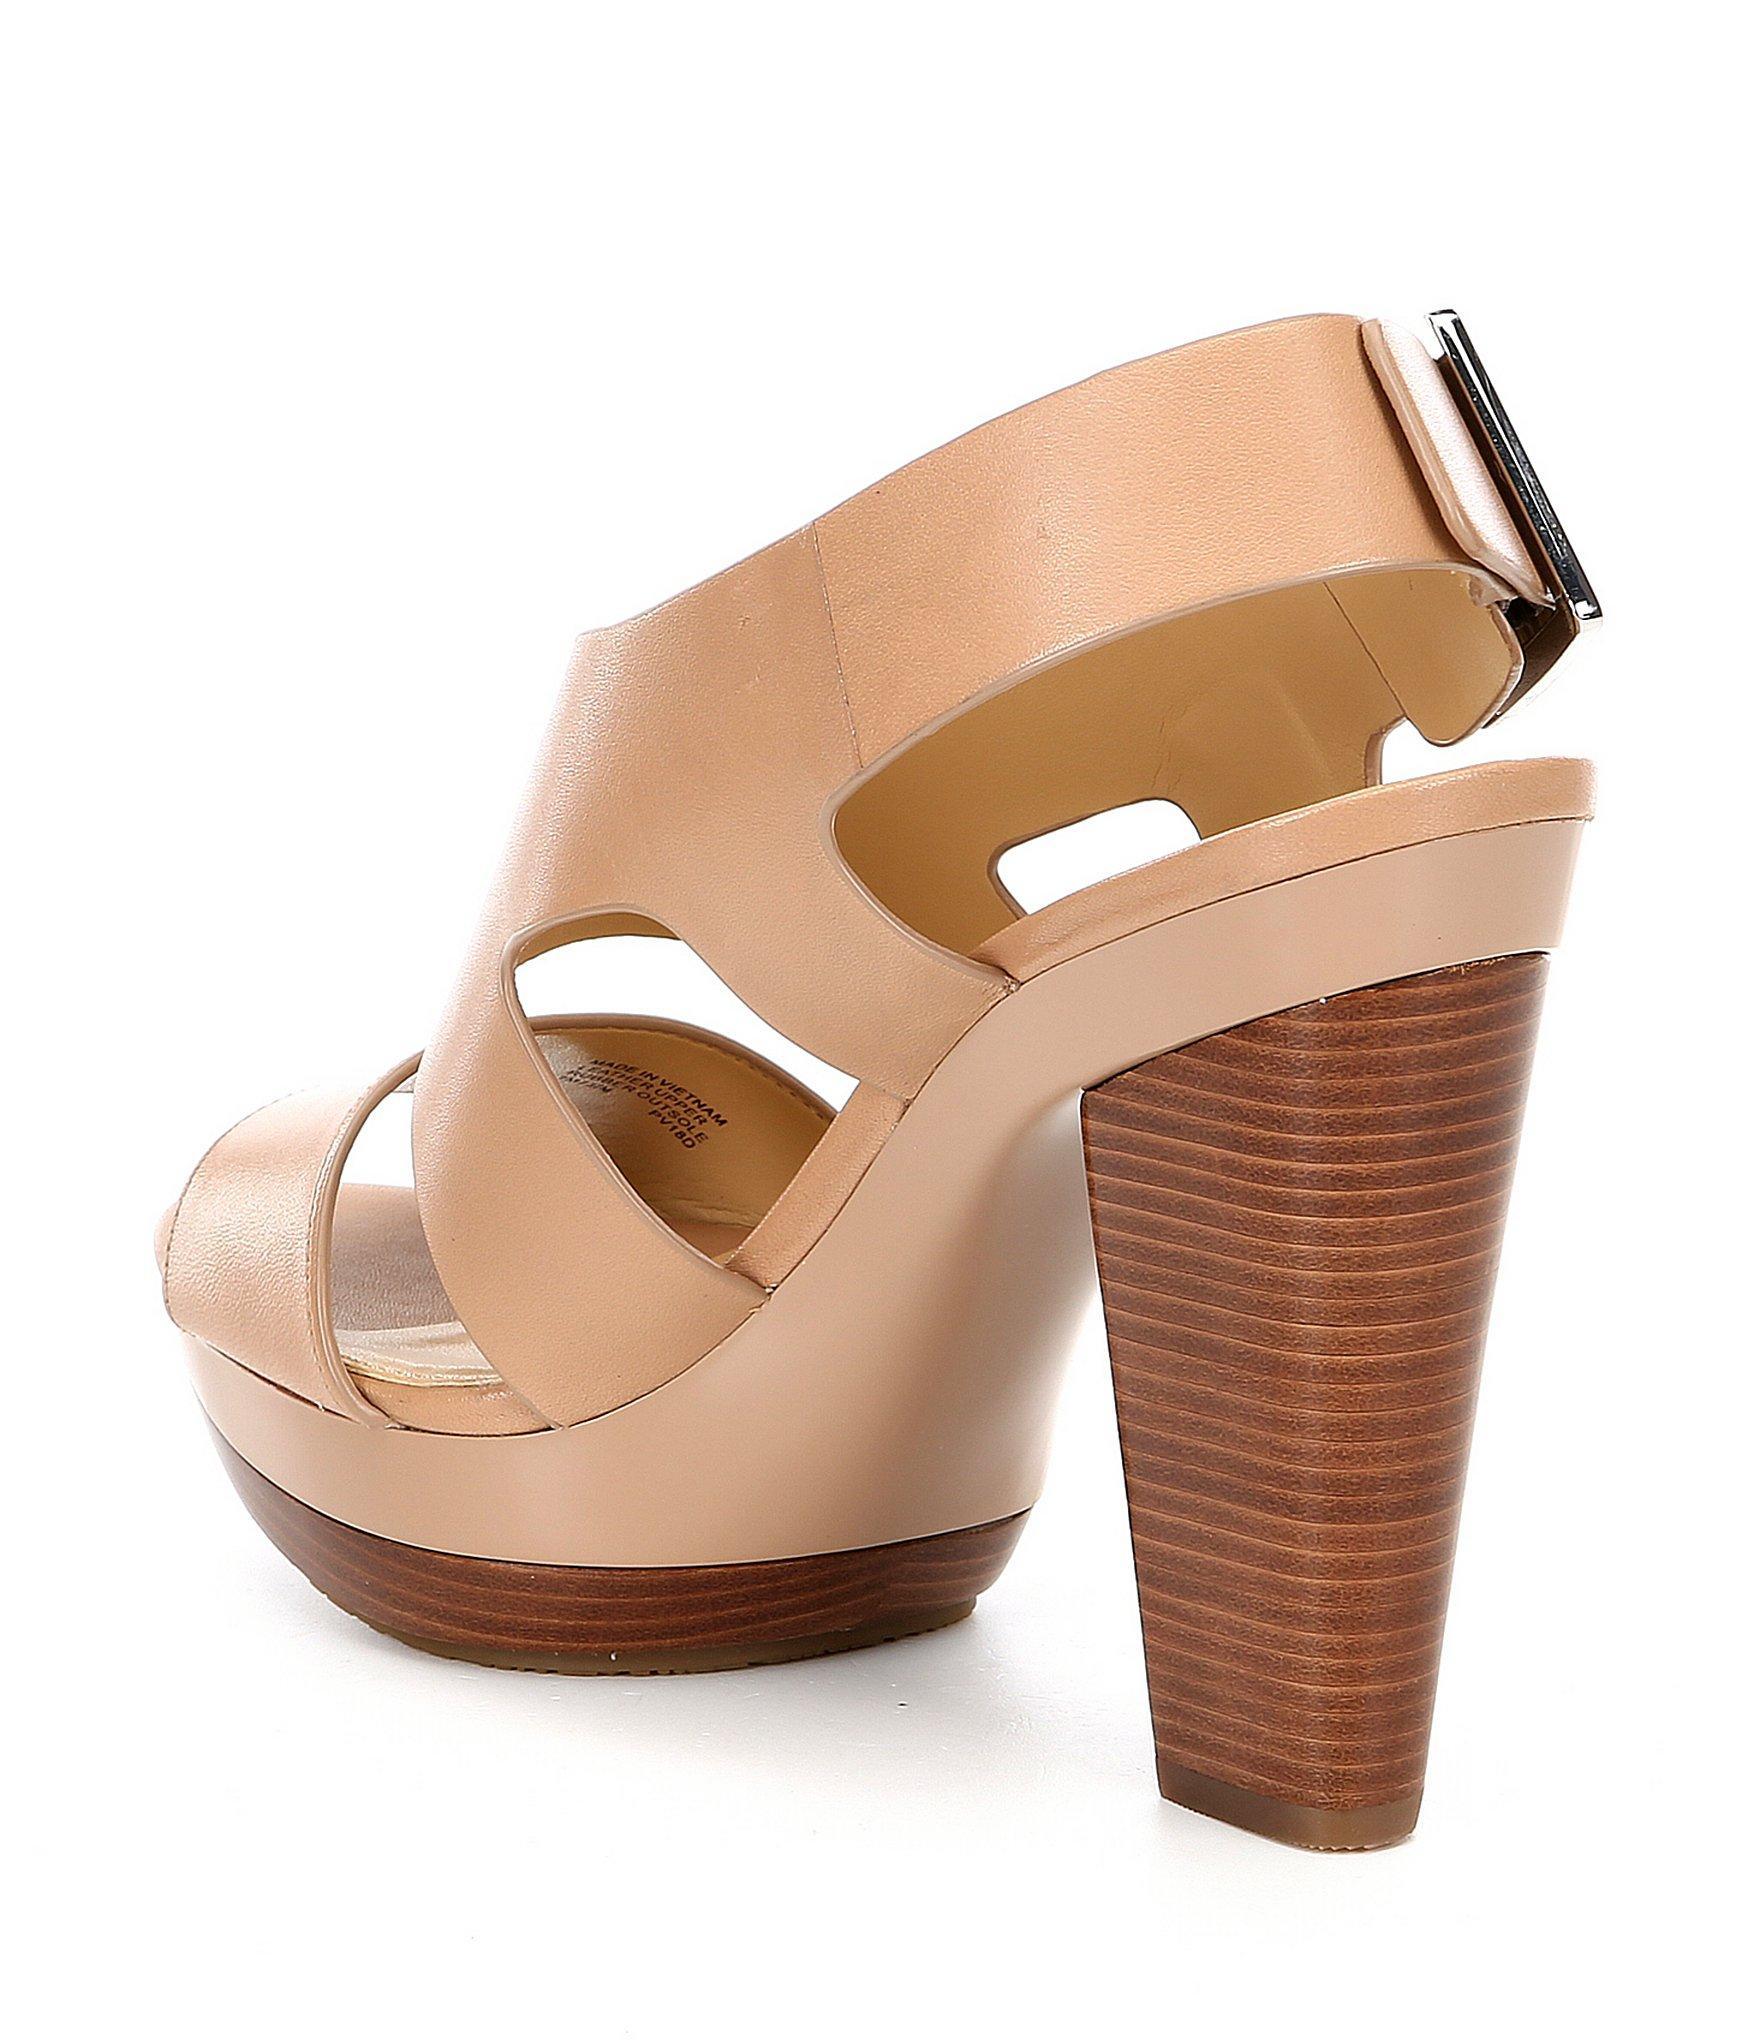 f87b6de599a MICHAEL Michael Kors - Brown Carla Leather Platform Block Heel Sandals -  Lyst. View fullscreen